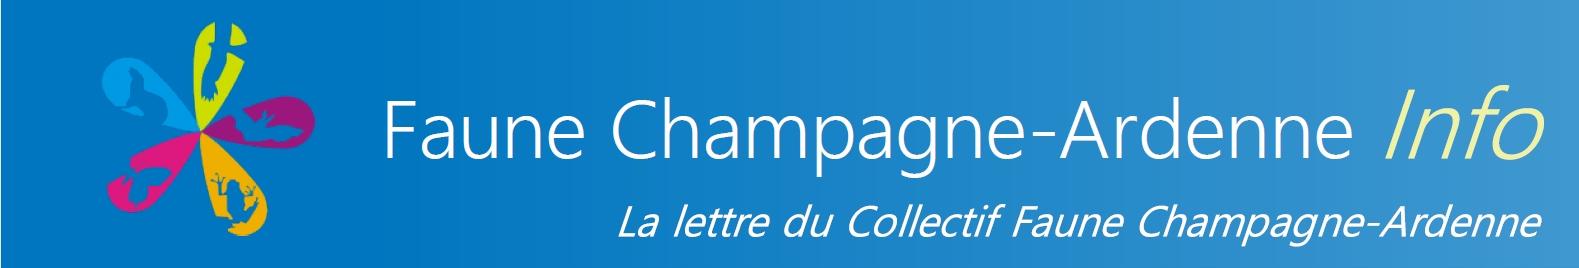 http://files.biolovision.net/www.faune-champagne-ardenne.org/userfiles/LettredinfoFCA/bandeaupresentationFauneChampagne-ArdenneInfo2.jpg